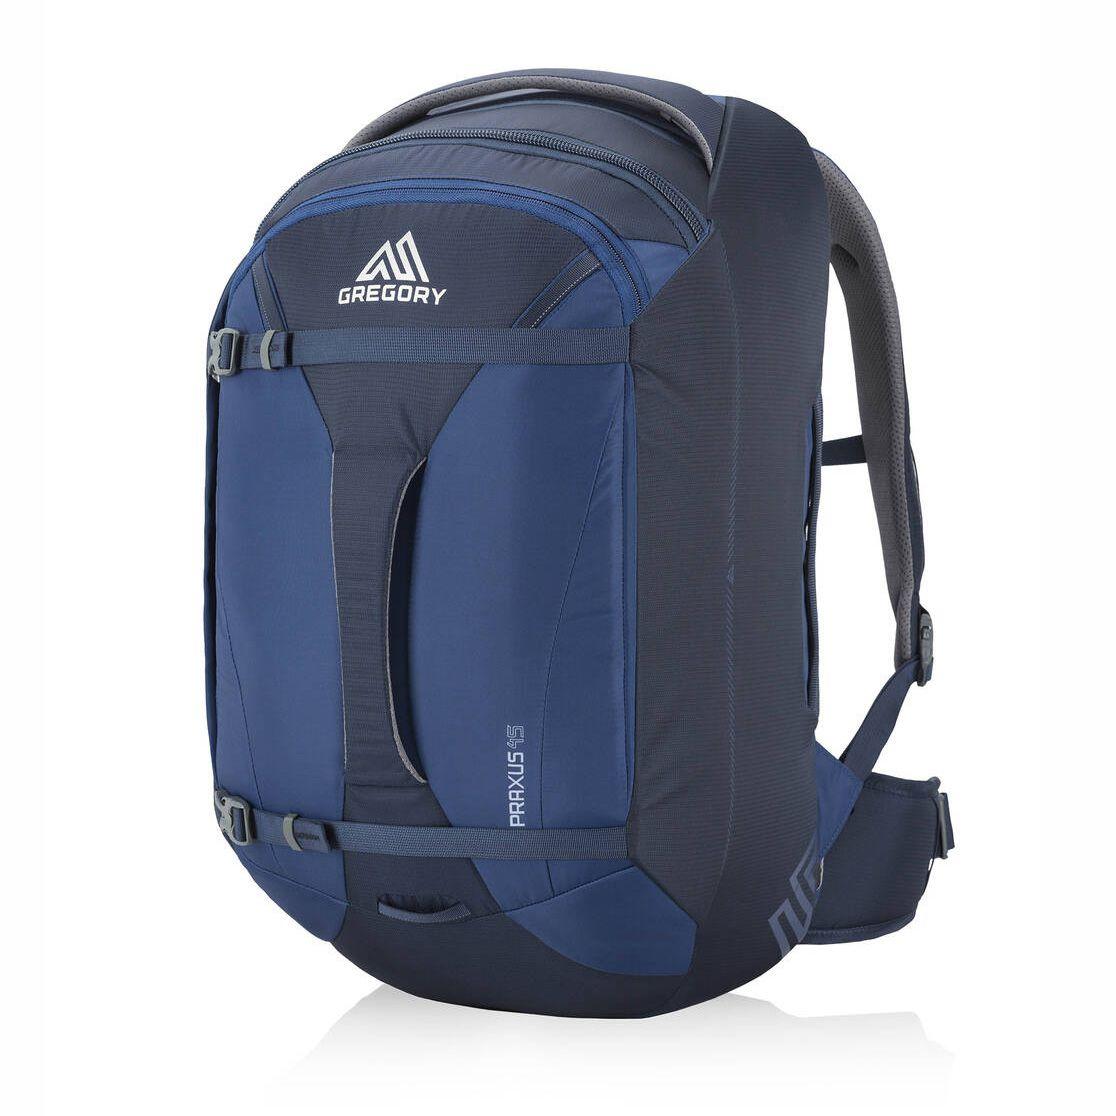 Praxus 45 Travel Pack